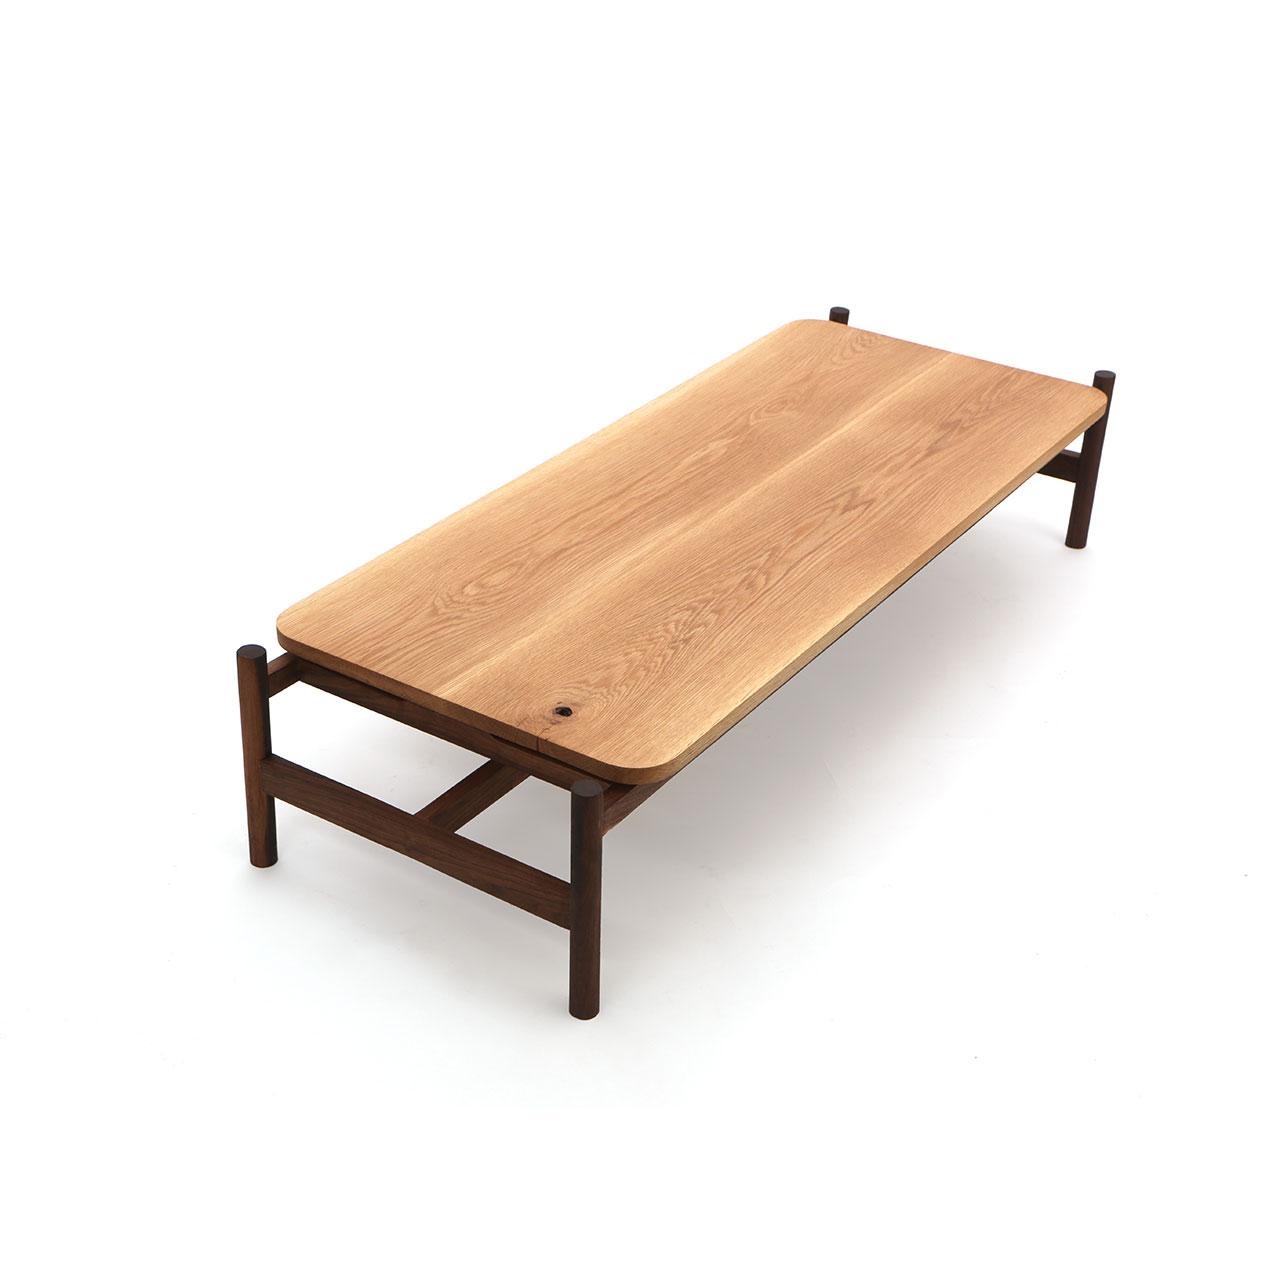 LOGGIA/Low table